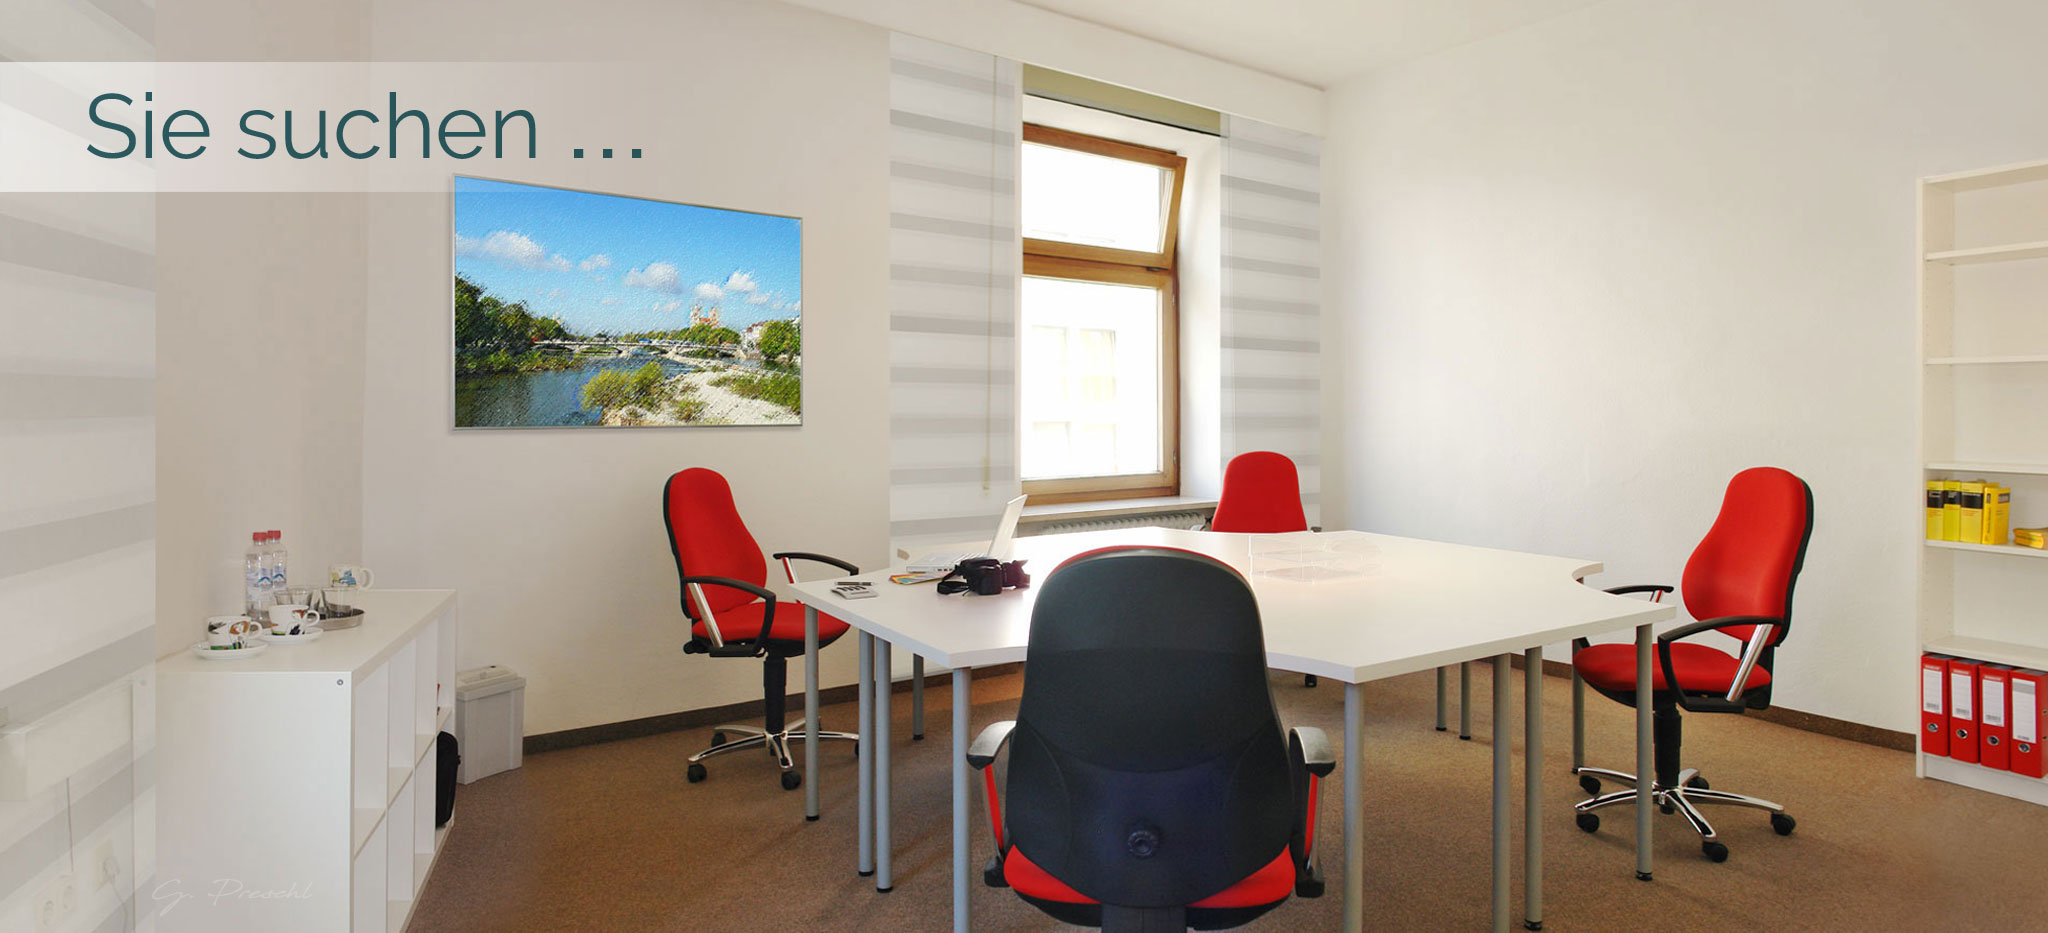 Büro-HP-Titel-Galerie-2048x-2021-03